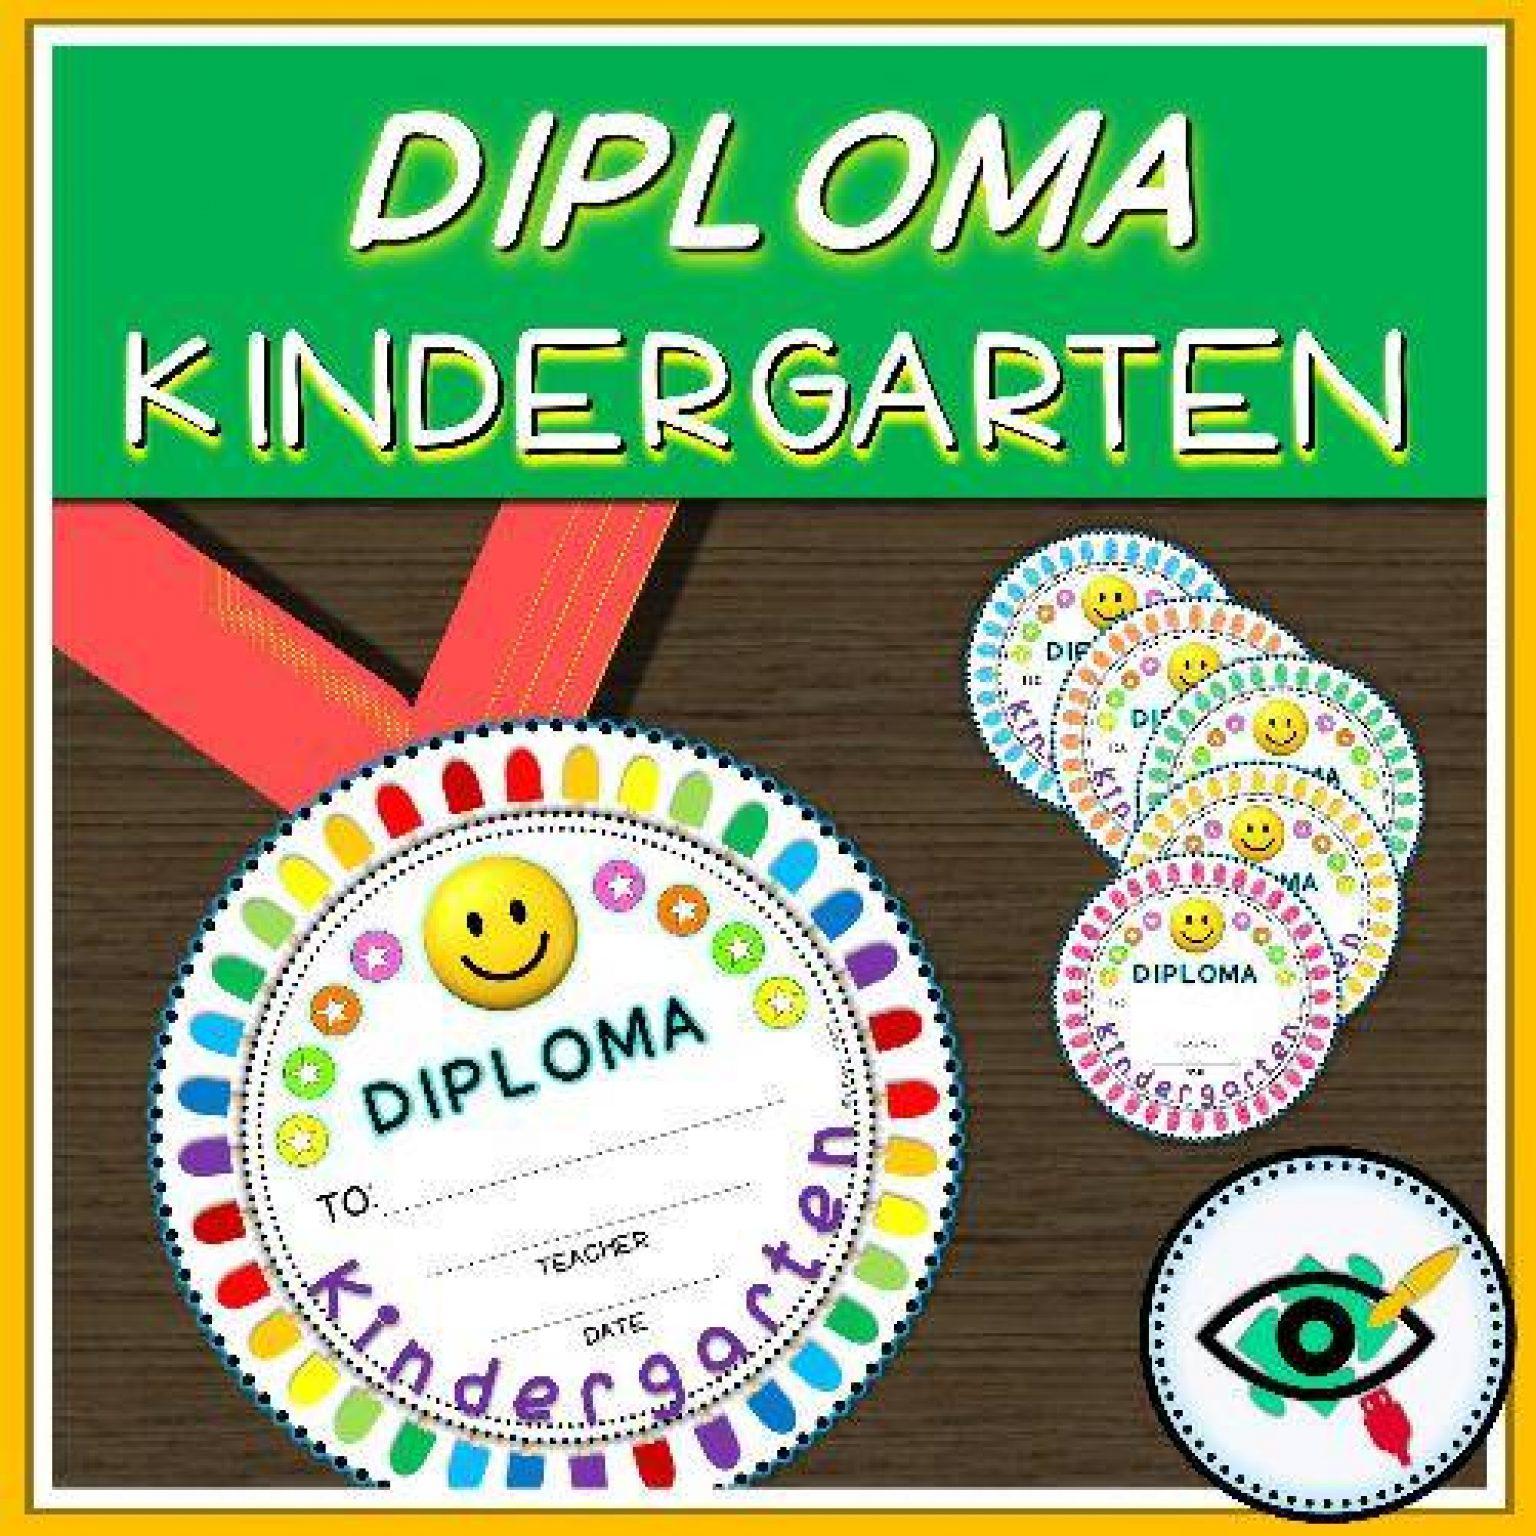 seasonal-end-of-year-rounded-diploma-kindergarten-title_resized